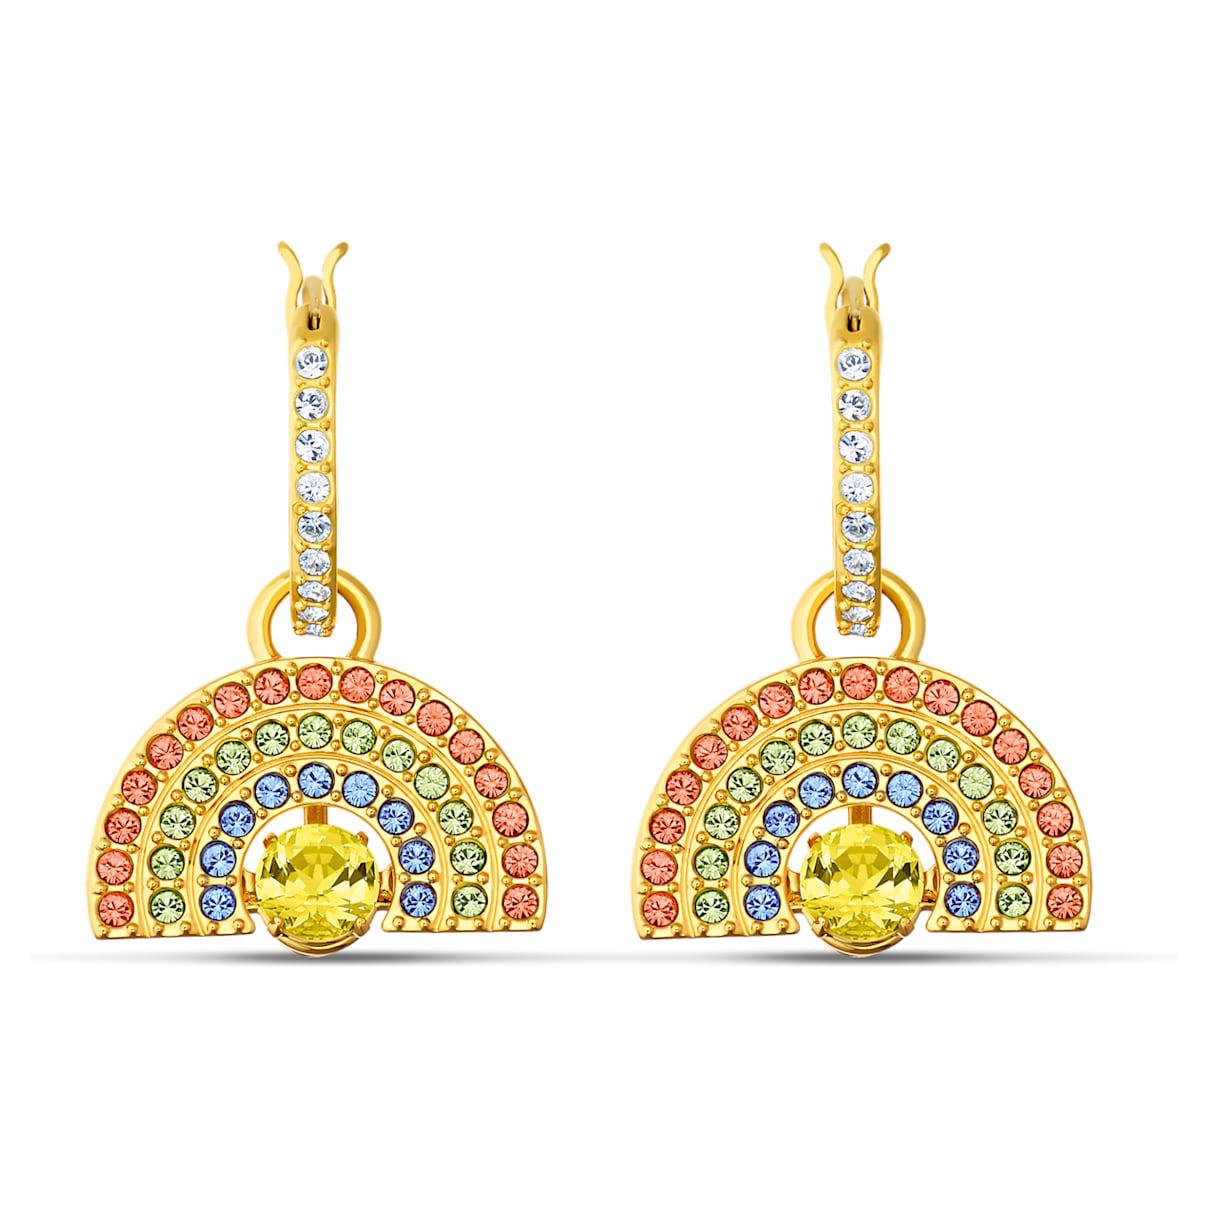 Swarovski Sparkling Dance Rainbow Pierced Earrings Light multi-colored, Gold-tone plated